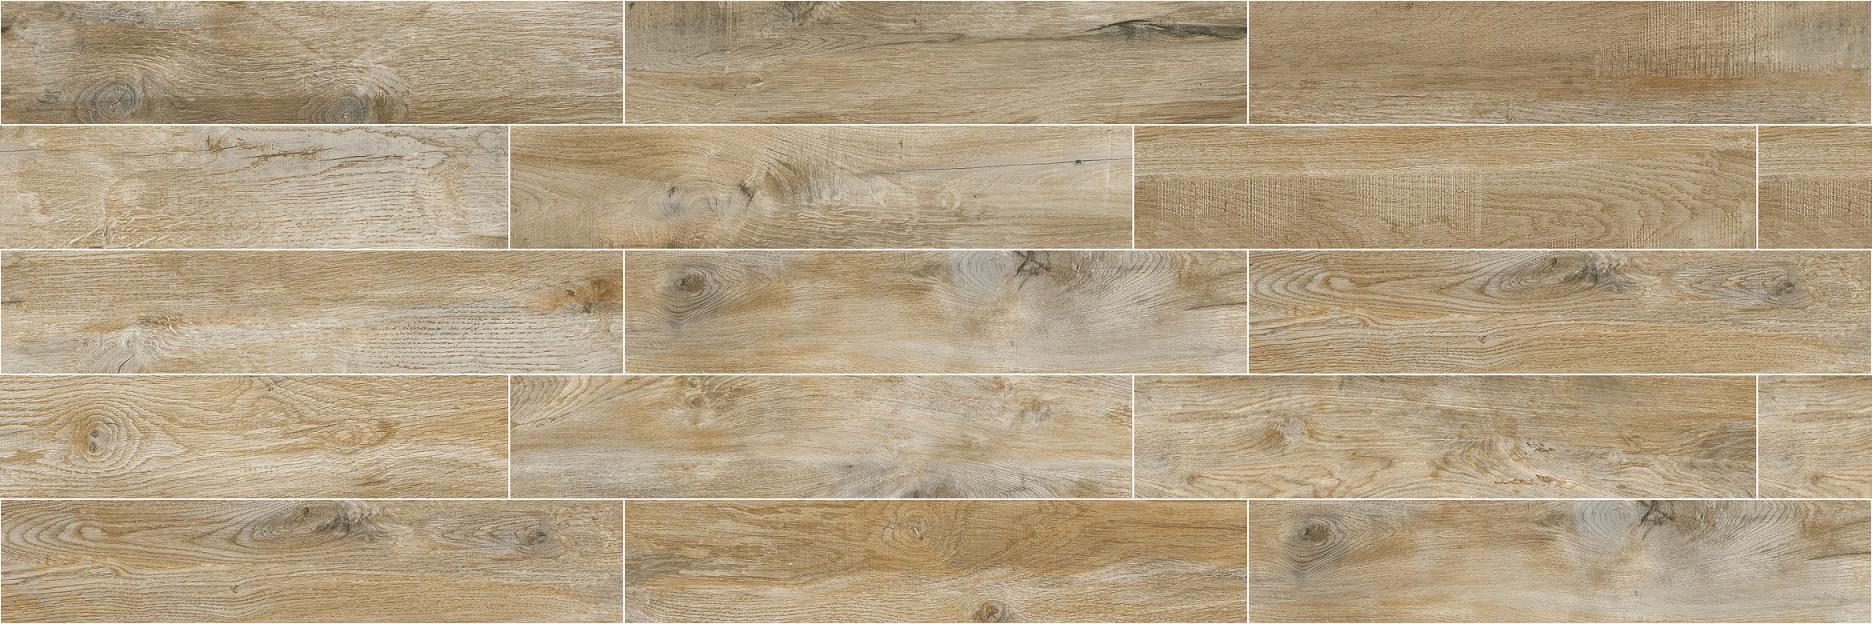 High Quality Building Material Porcelain Wood Tile Floor Tile Lnc2012022 Yellow